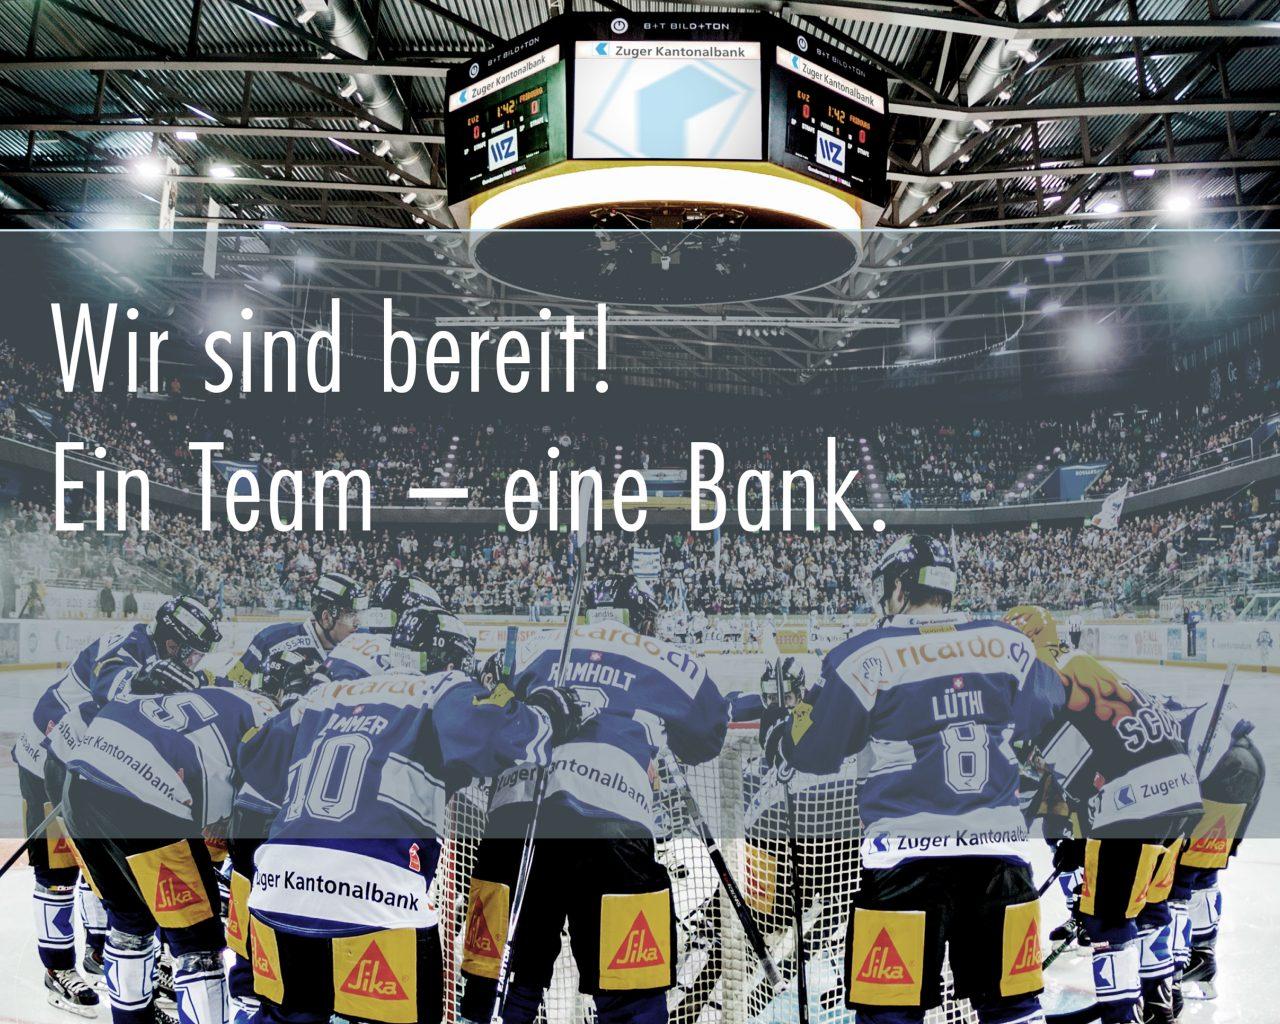 Zuger-Kantonalbank-Agentmedia-01